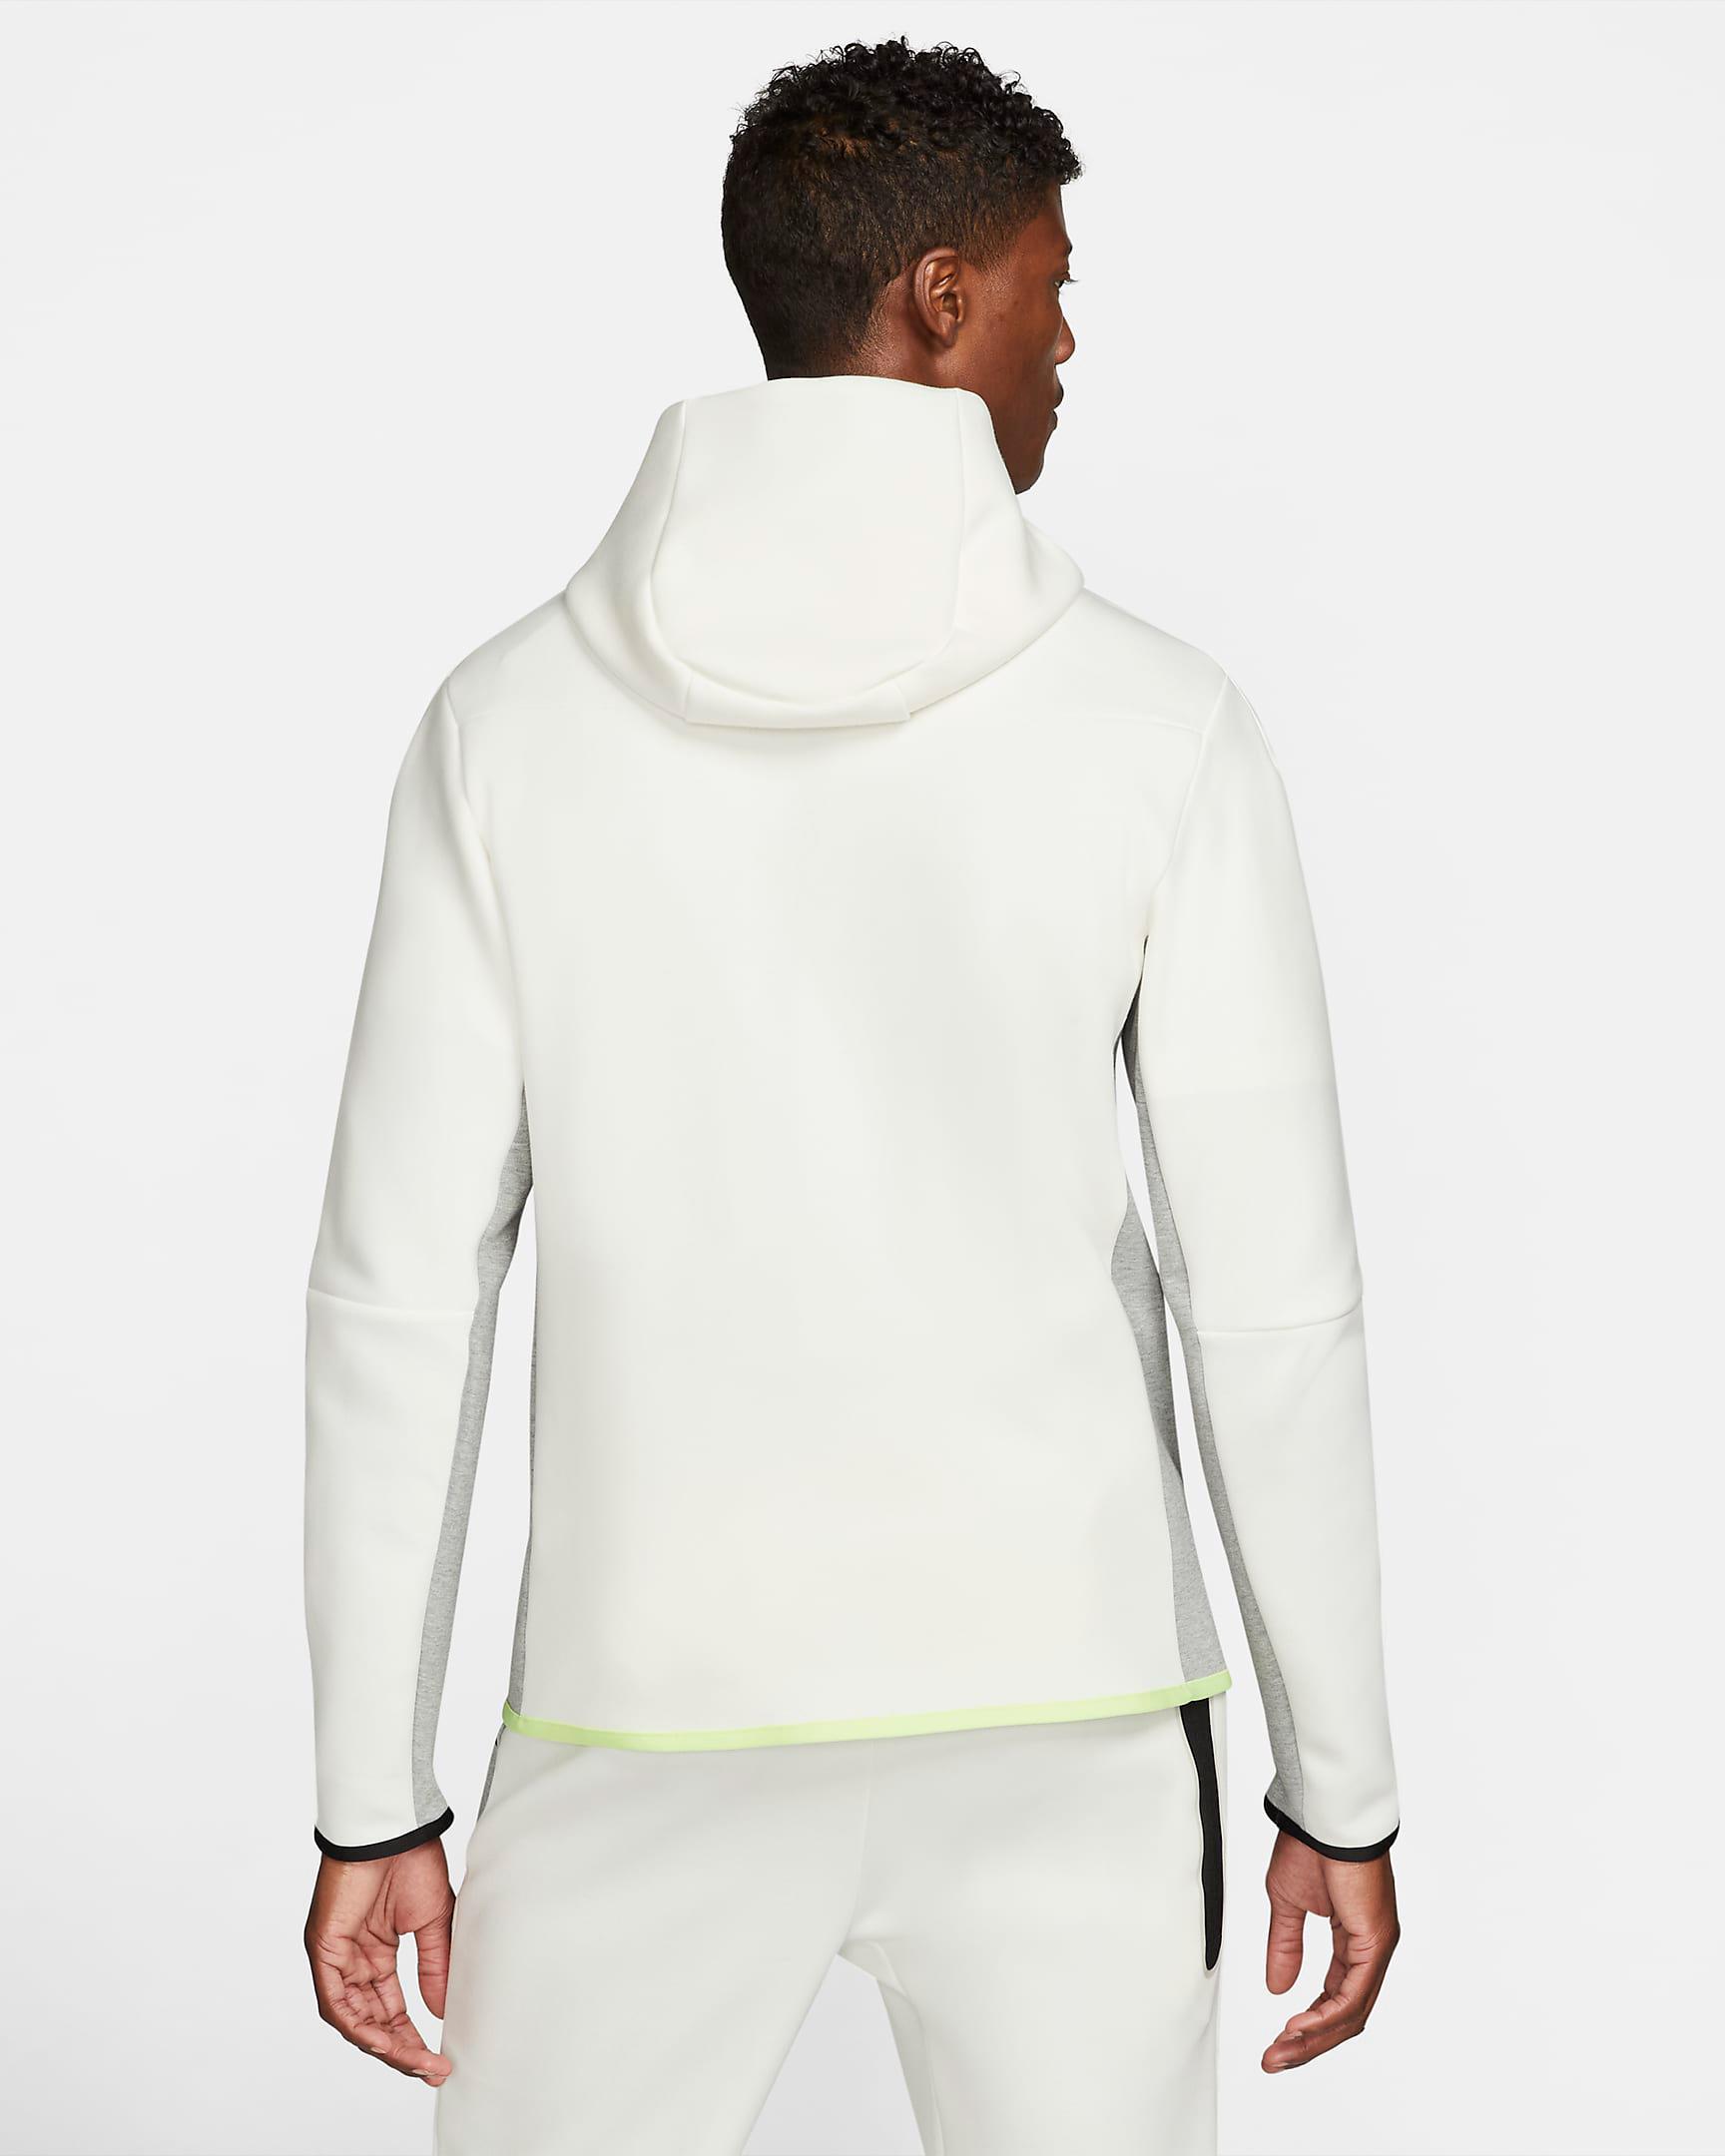 nike-tech-fleece-hoodie-sail-dark-grey-light-lemon-twist-2